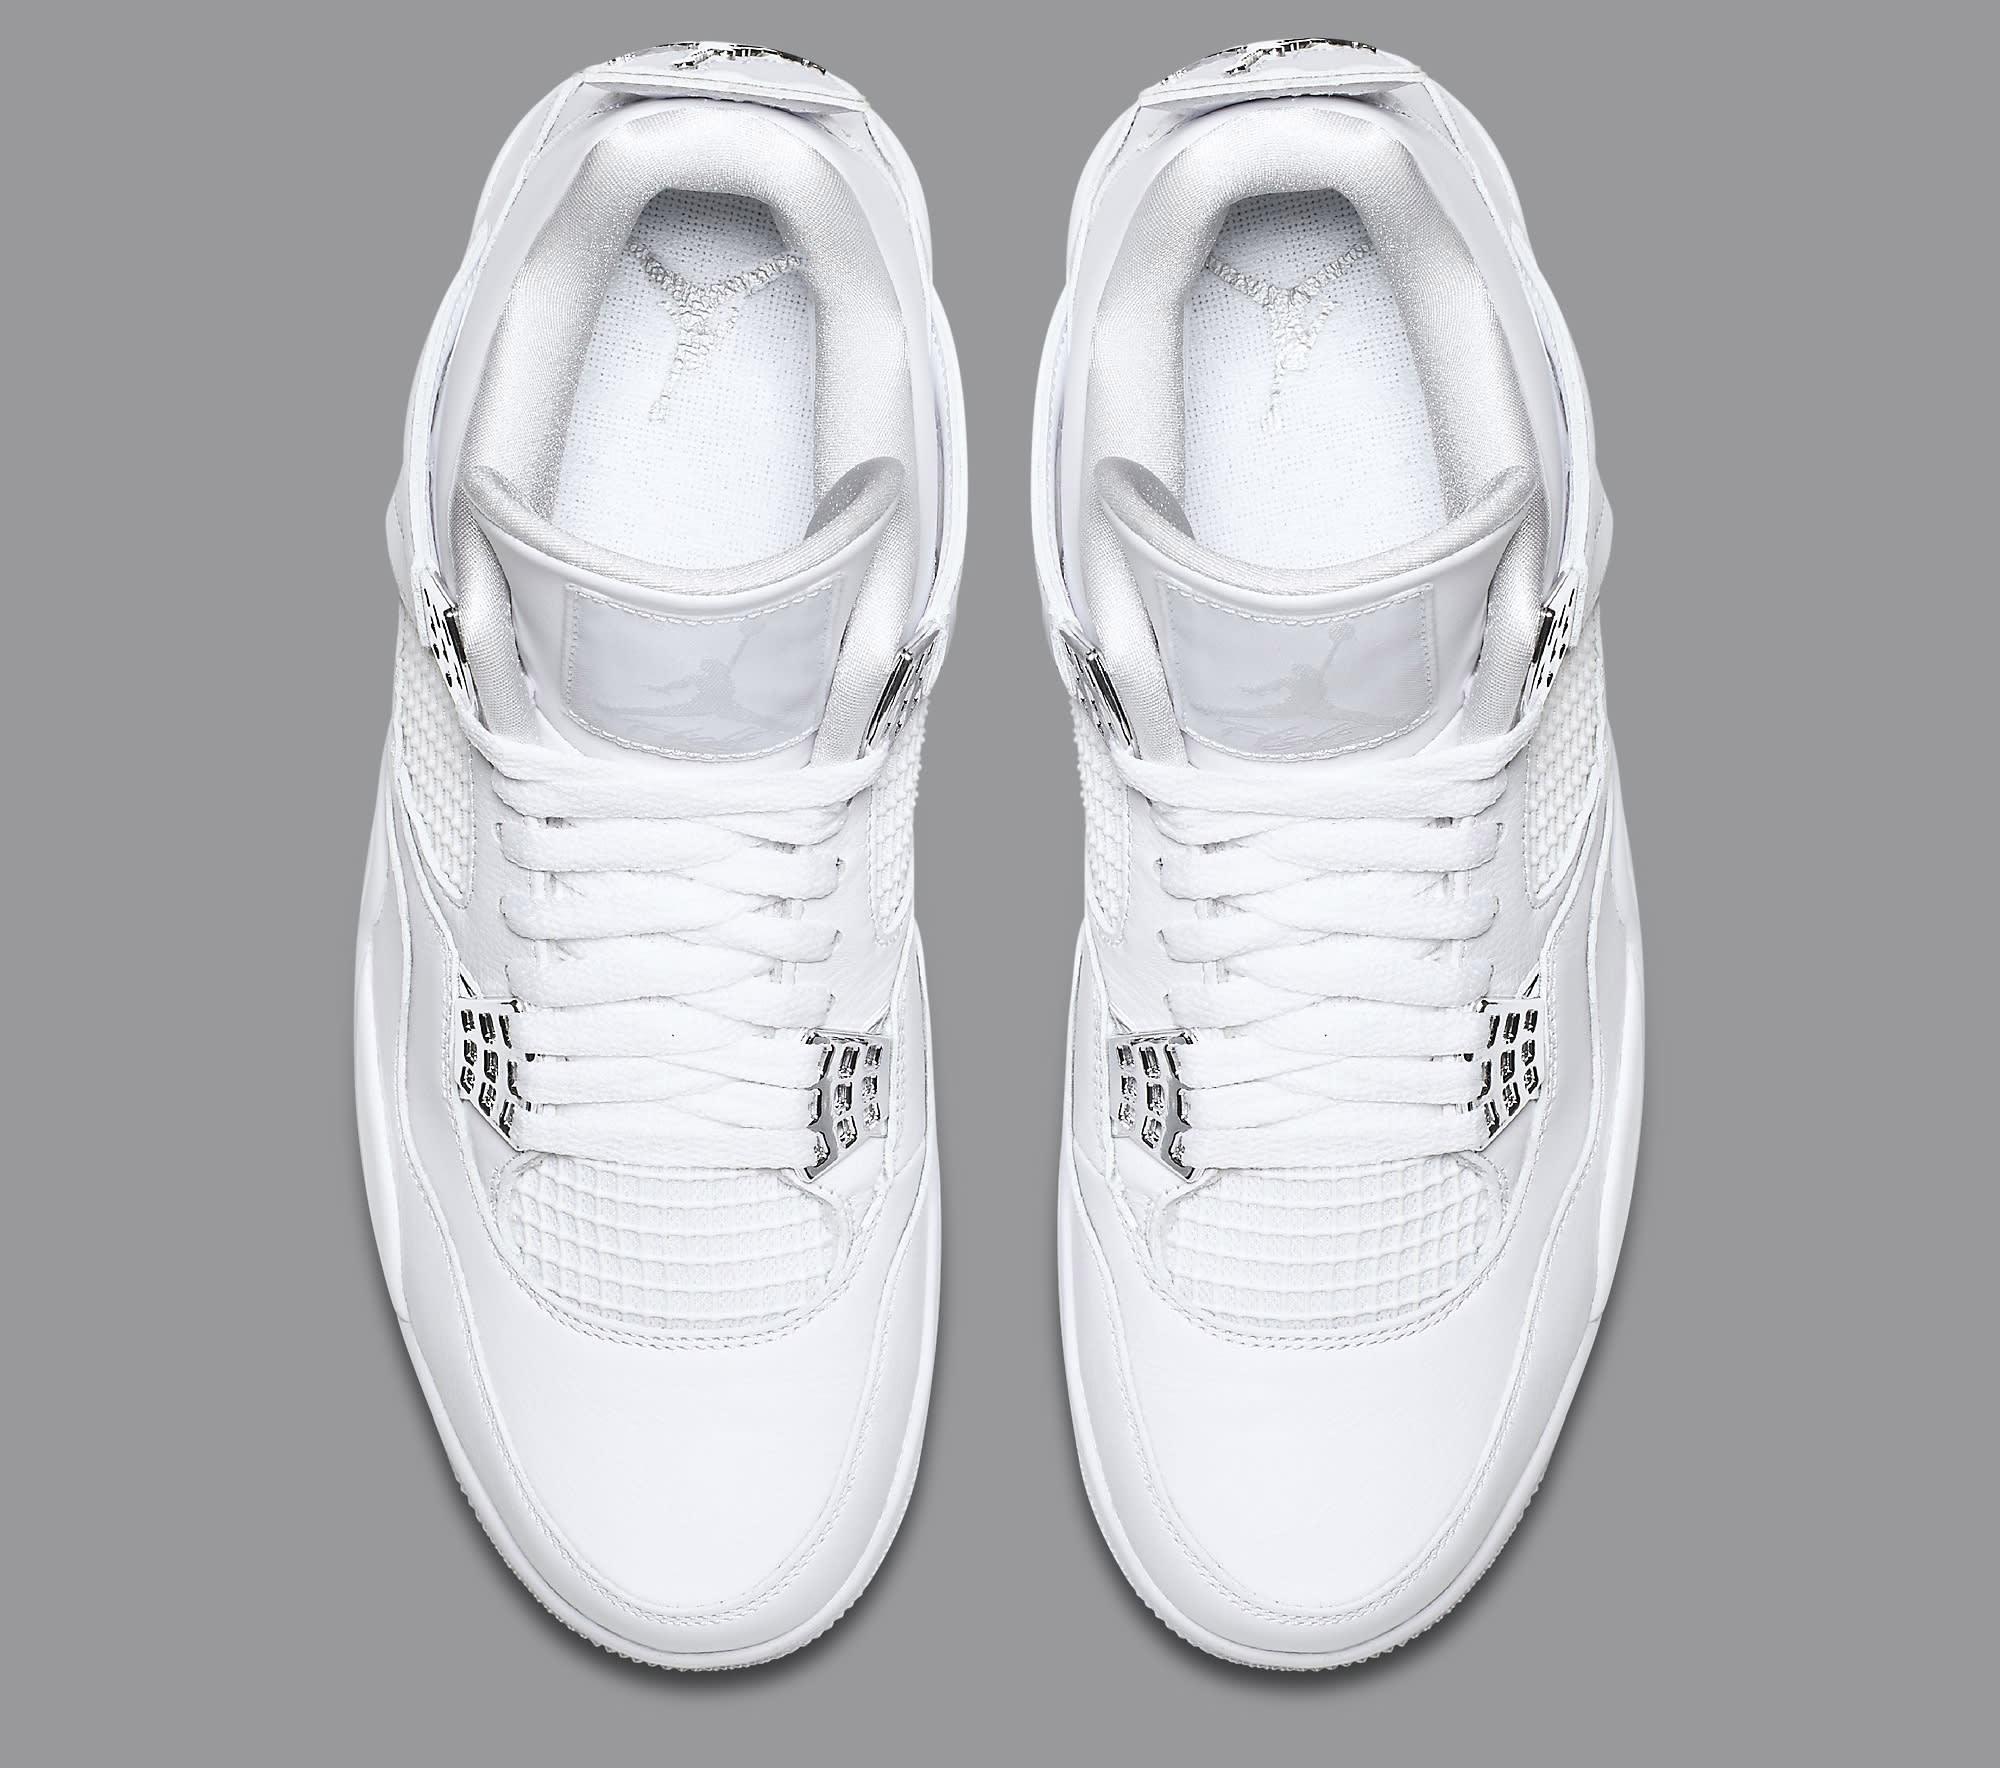 Pure Money Air Jordan 4 308497-100 Top